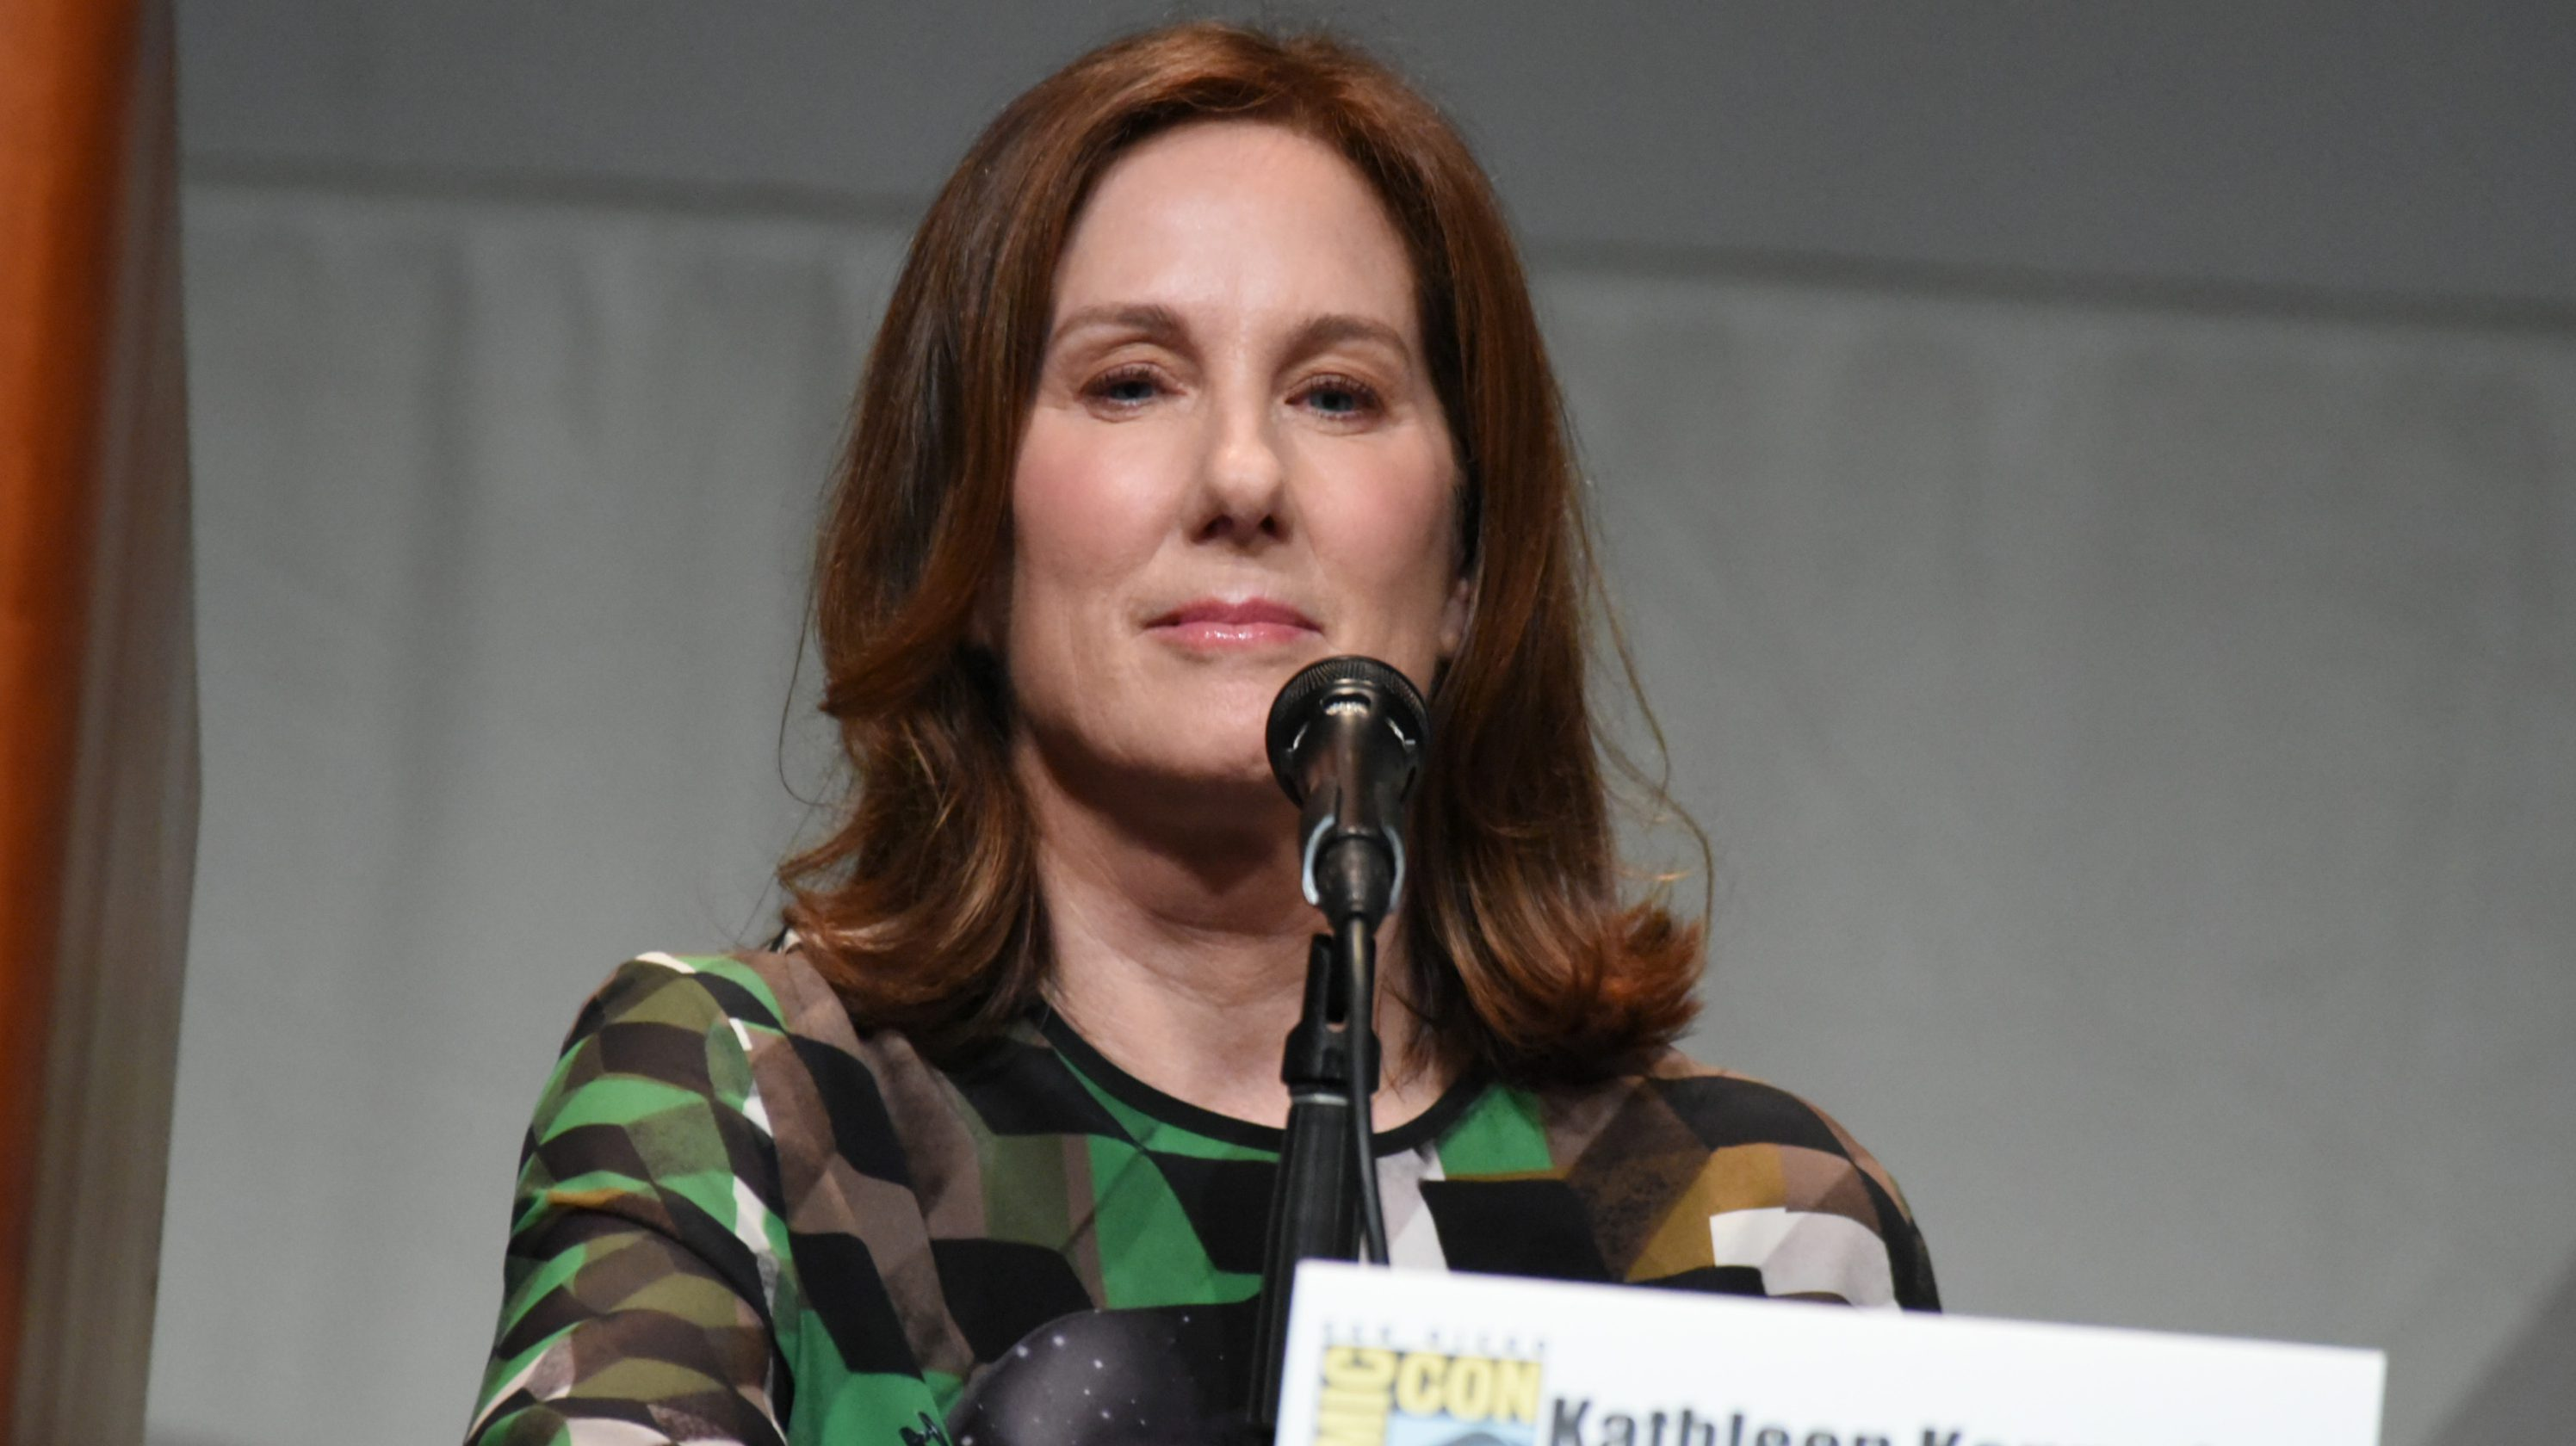 Kathleen Kennedy, Lucasfilm